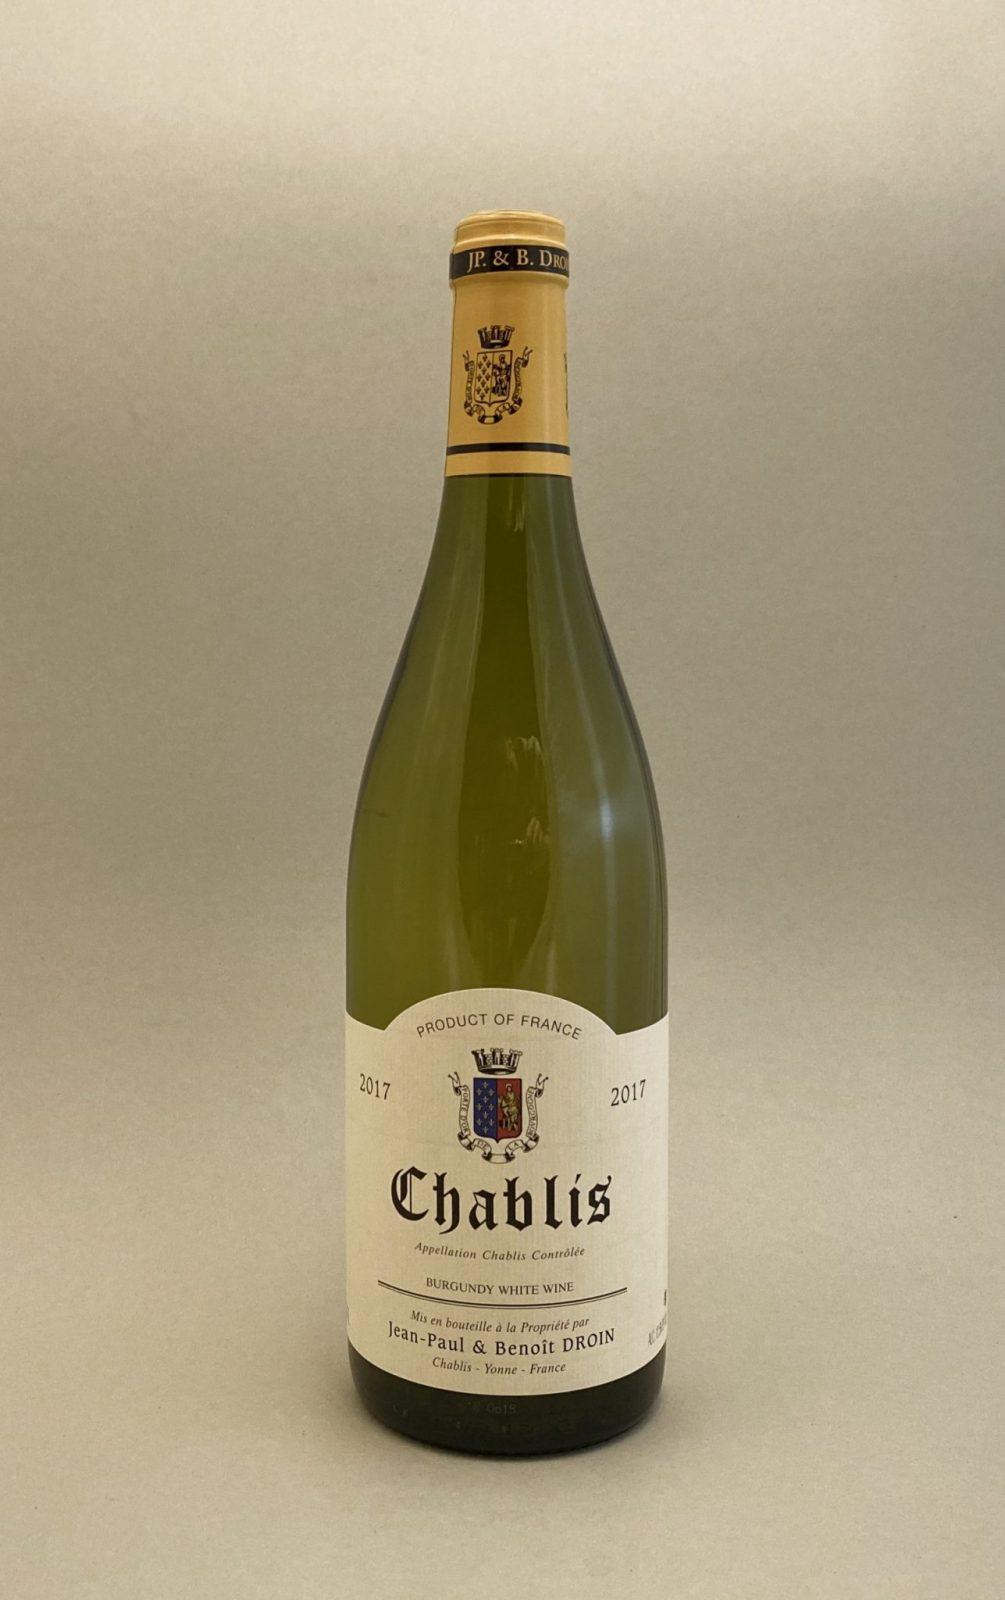 JEAN PAUL & BENOIT DROIN Chablis, vinoteka Bratislava slnecnice mesto, petrzalka, vino biele z Francúzska